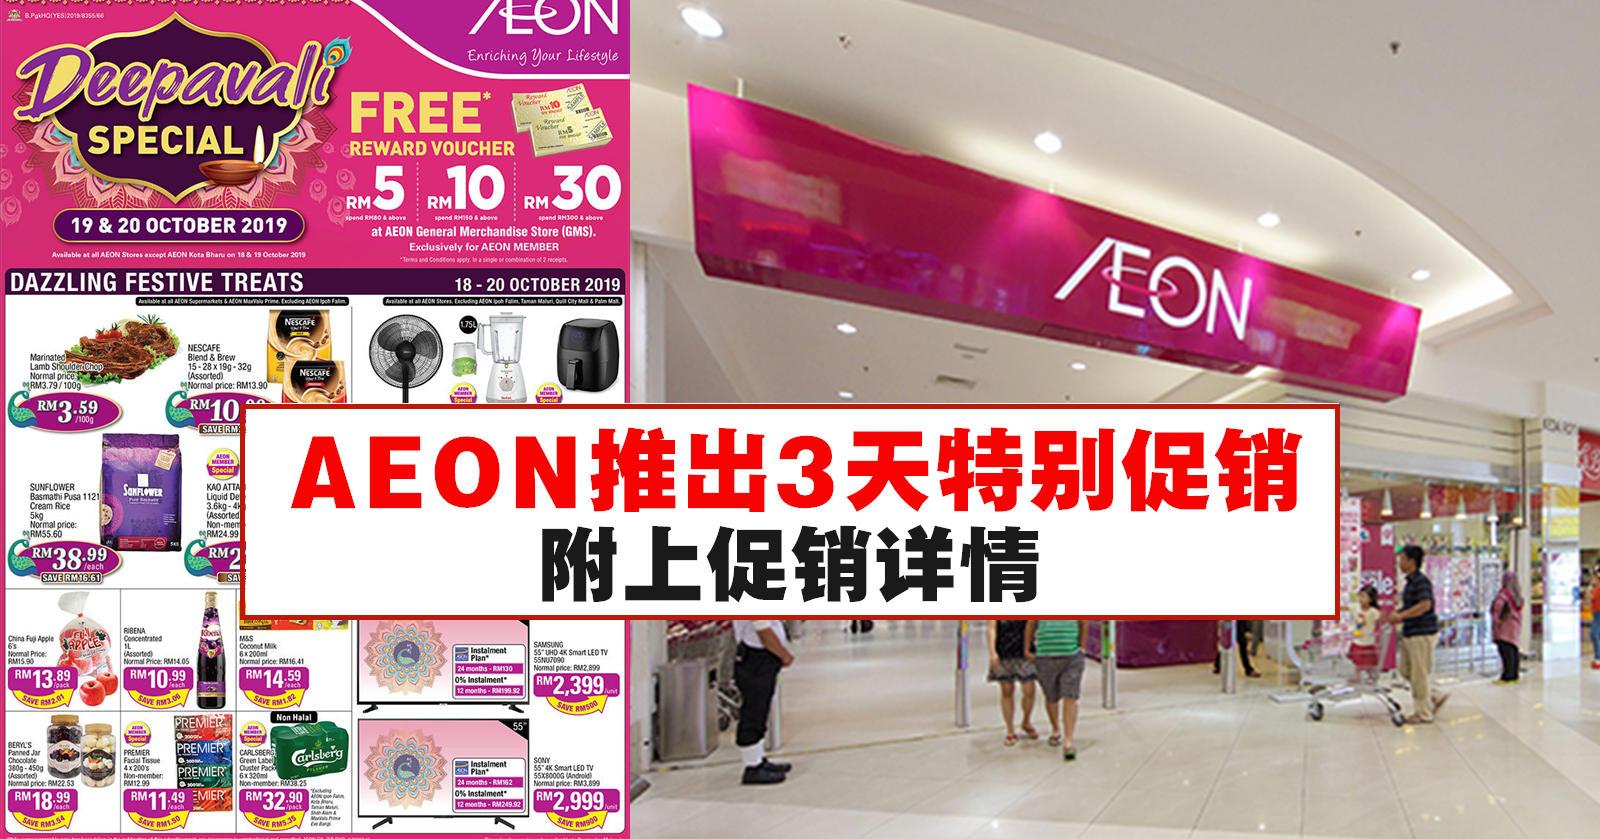 AEON推出特别促销活动